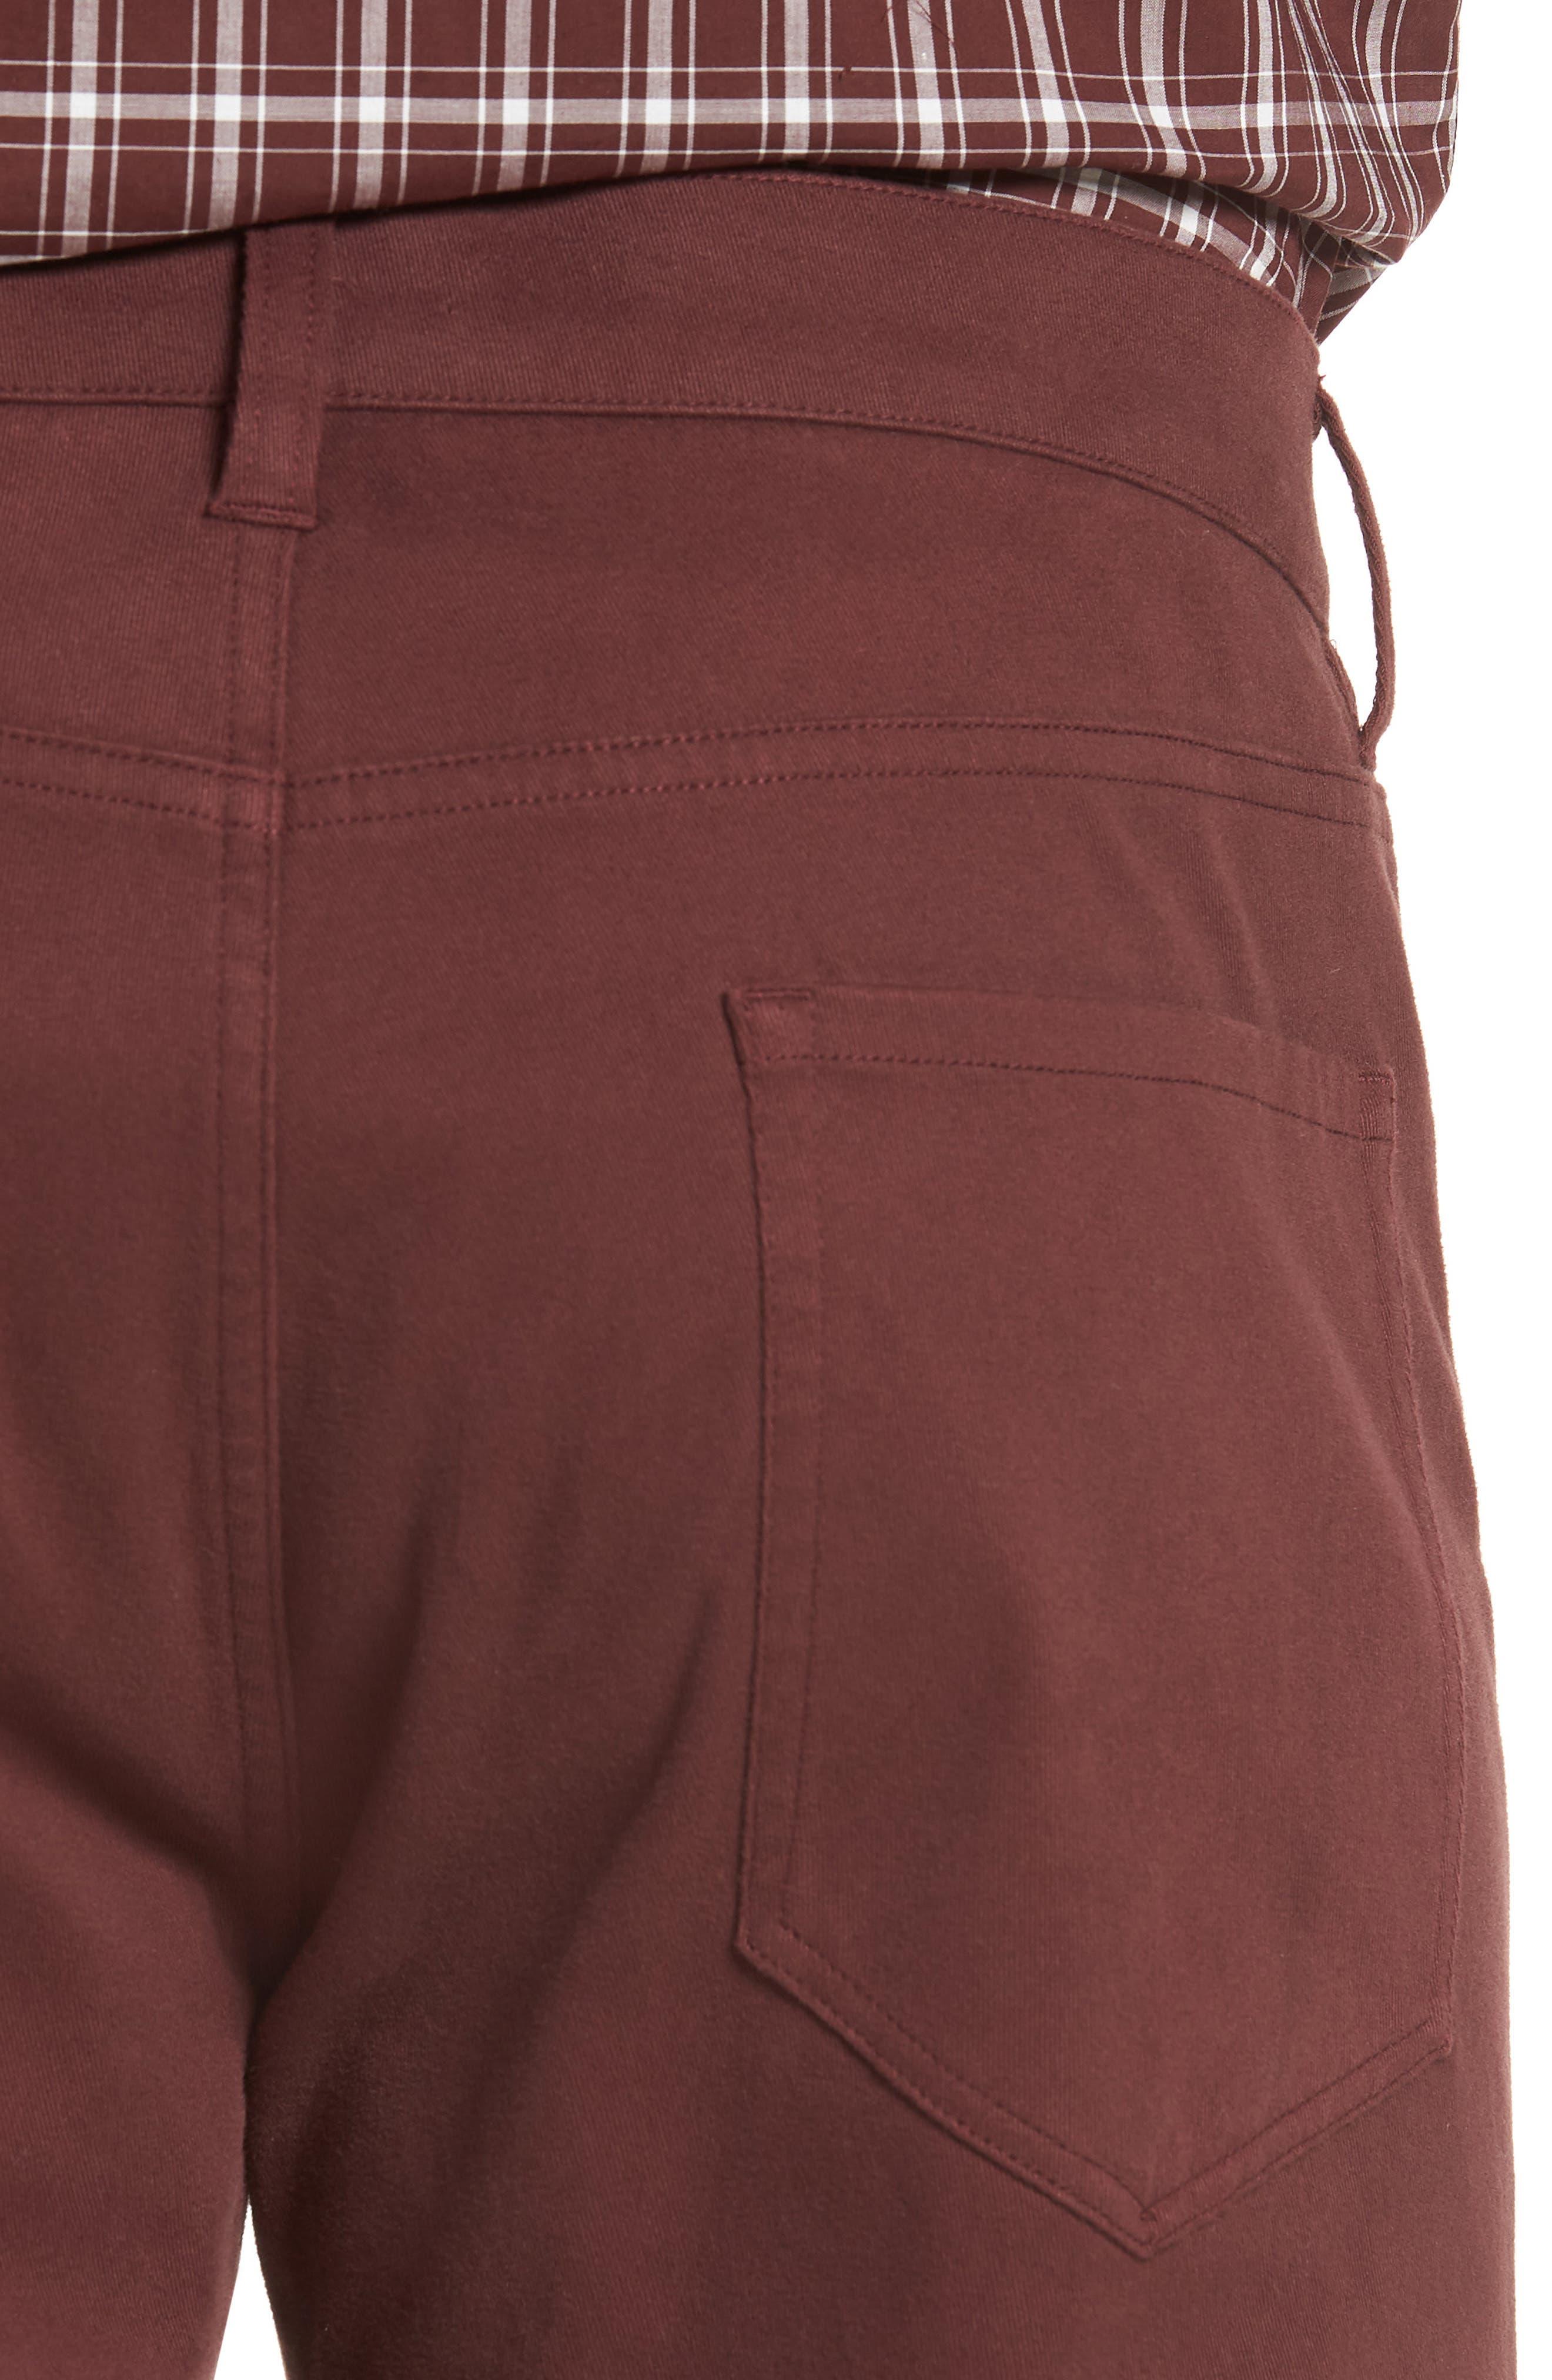 Regular Fit Five-Pocket Pants,                             Alternate thumbnail 8, color,